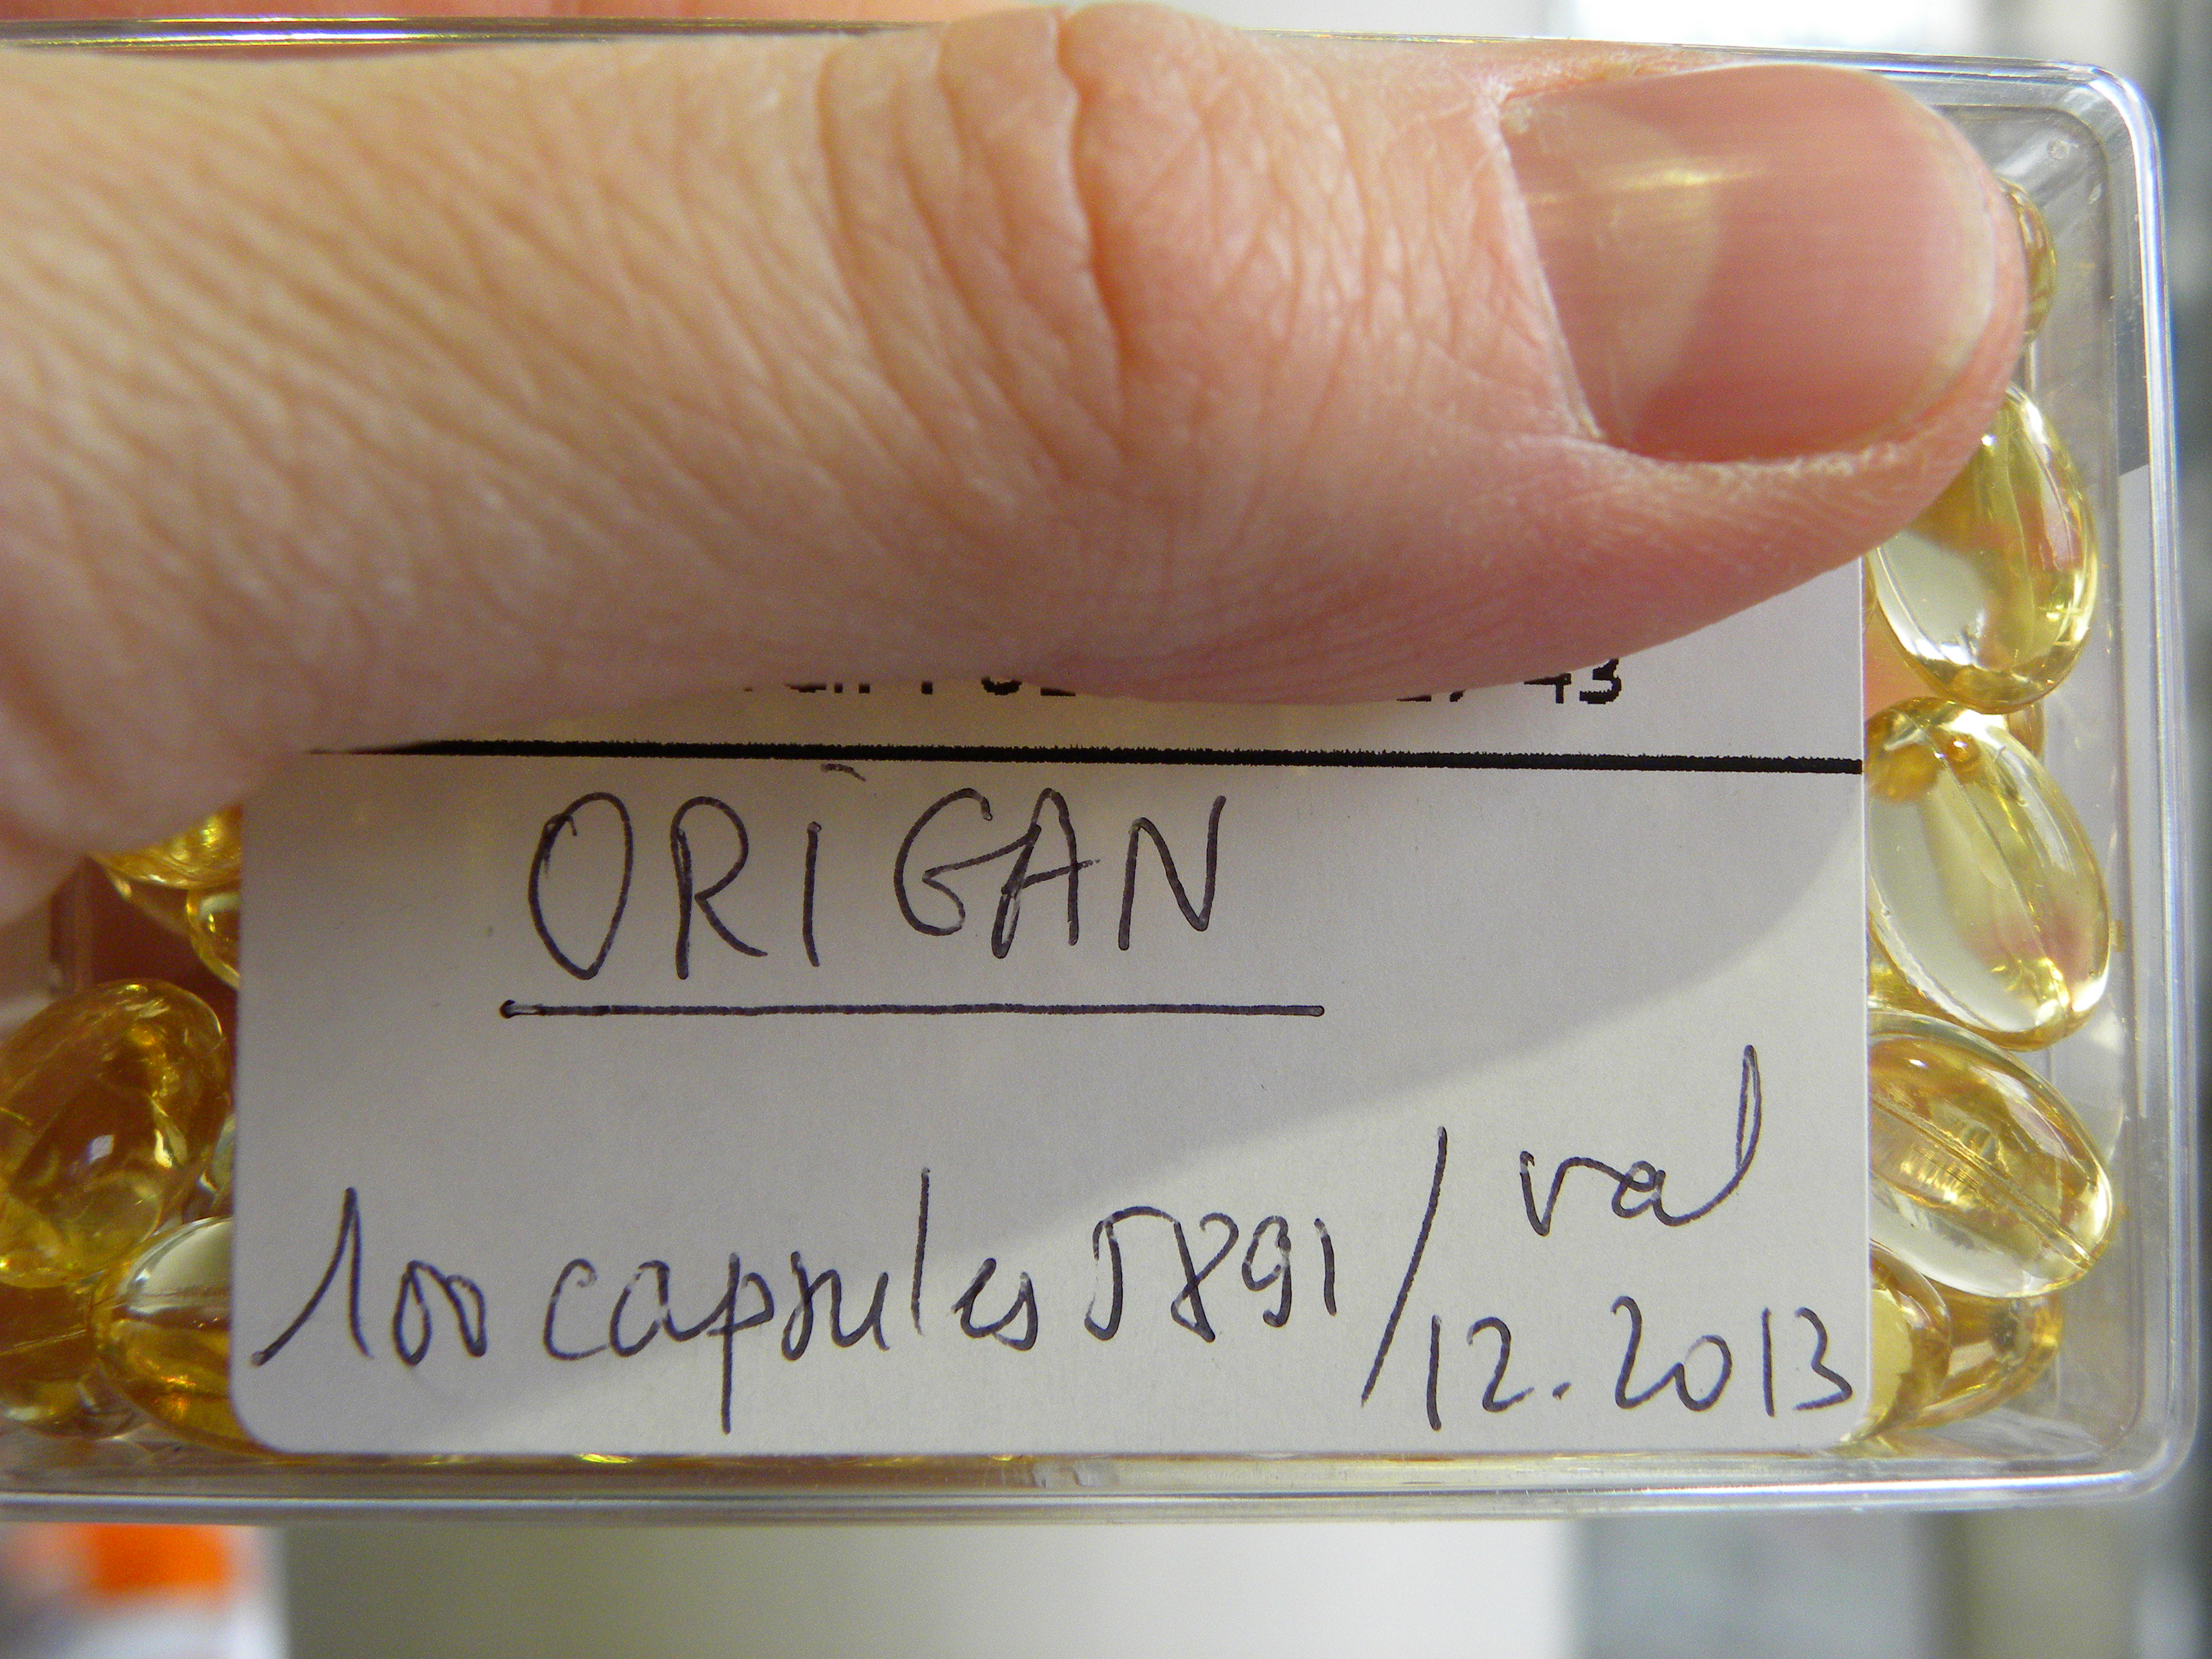 capsule origan